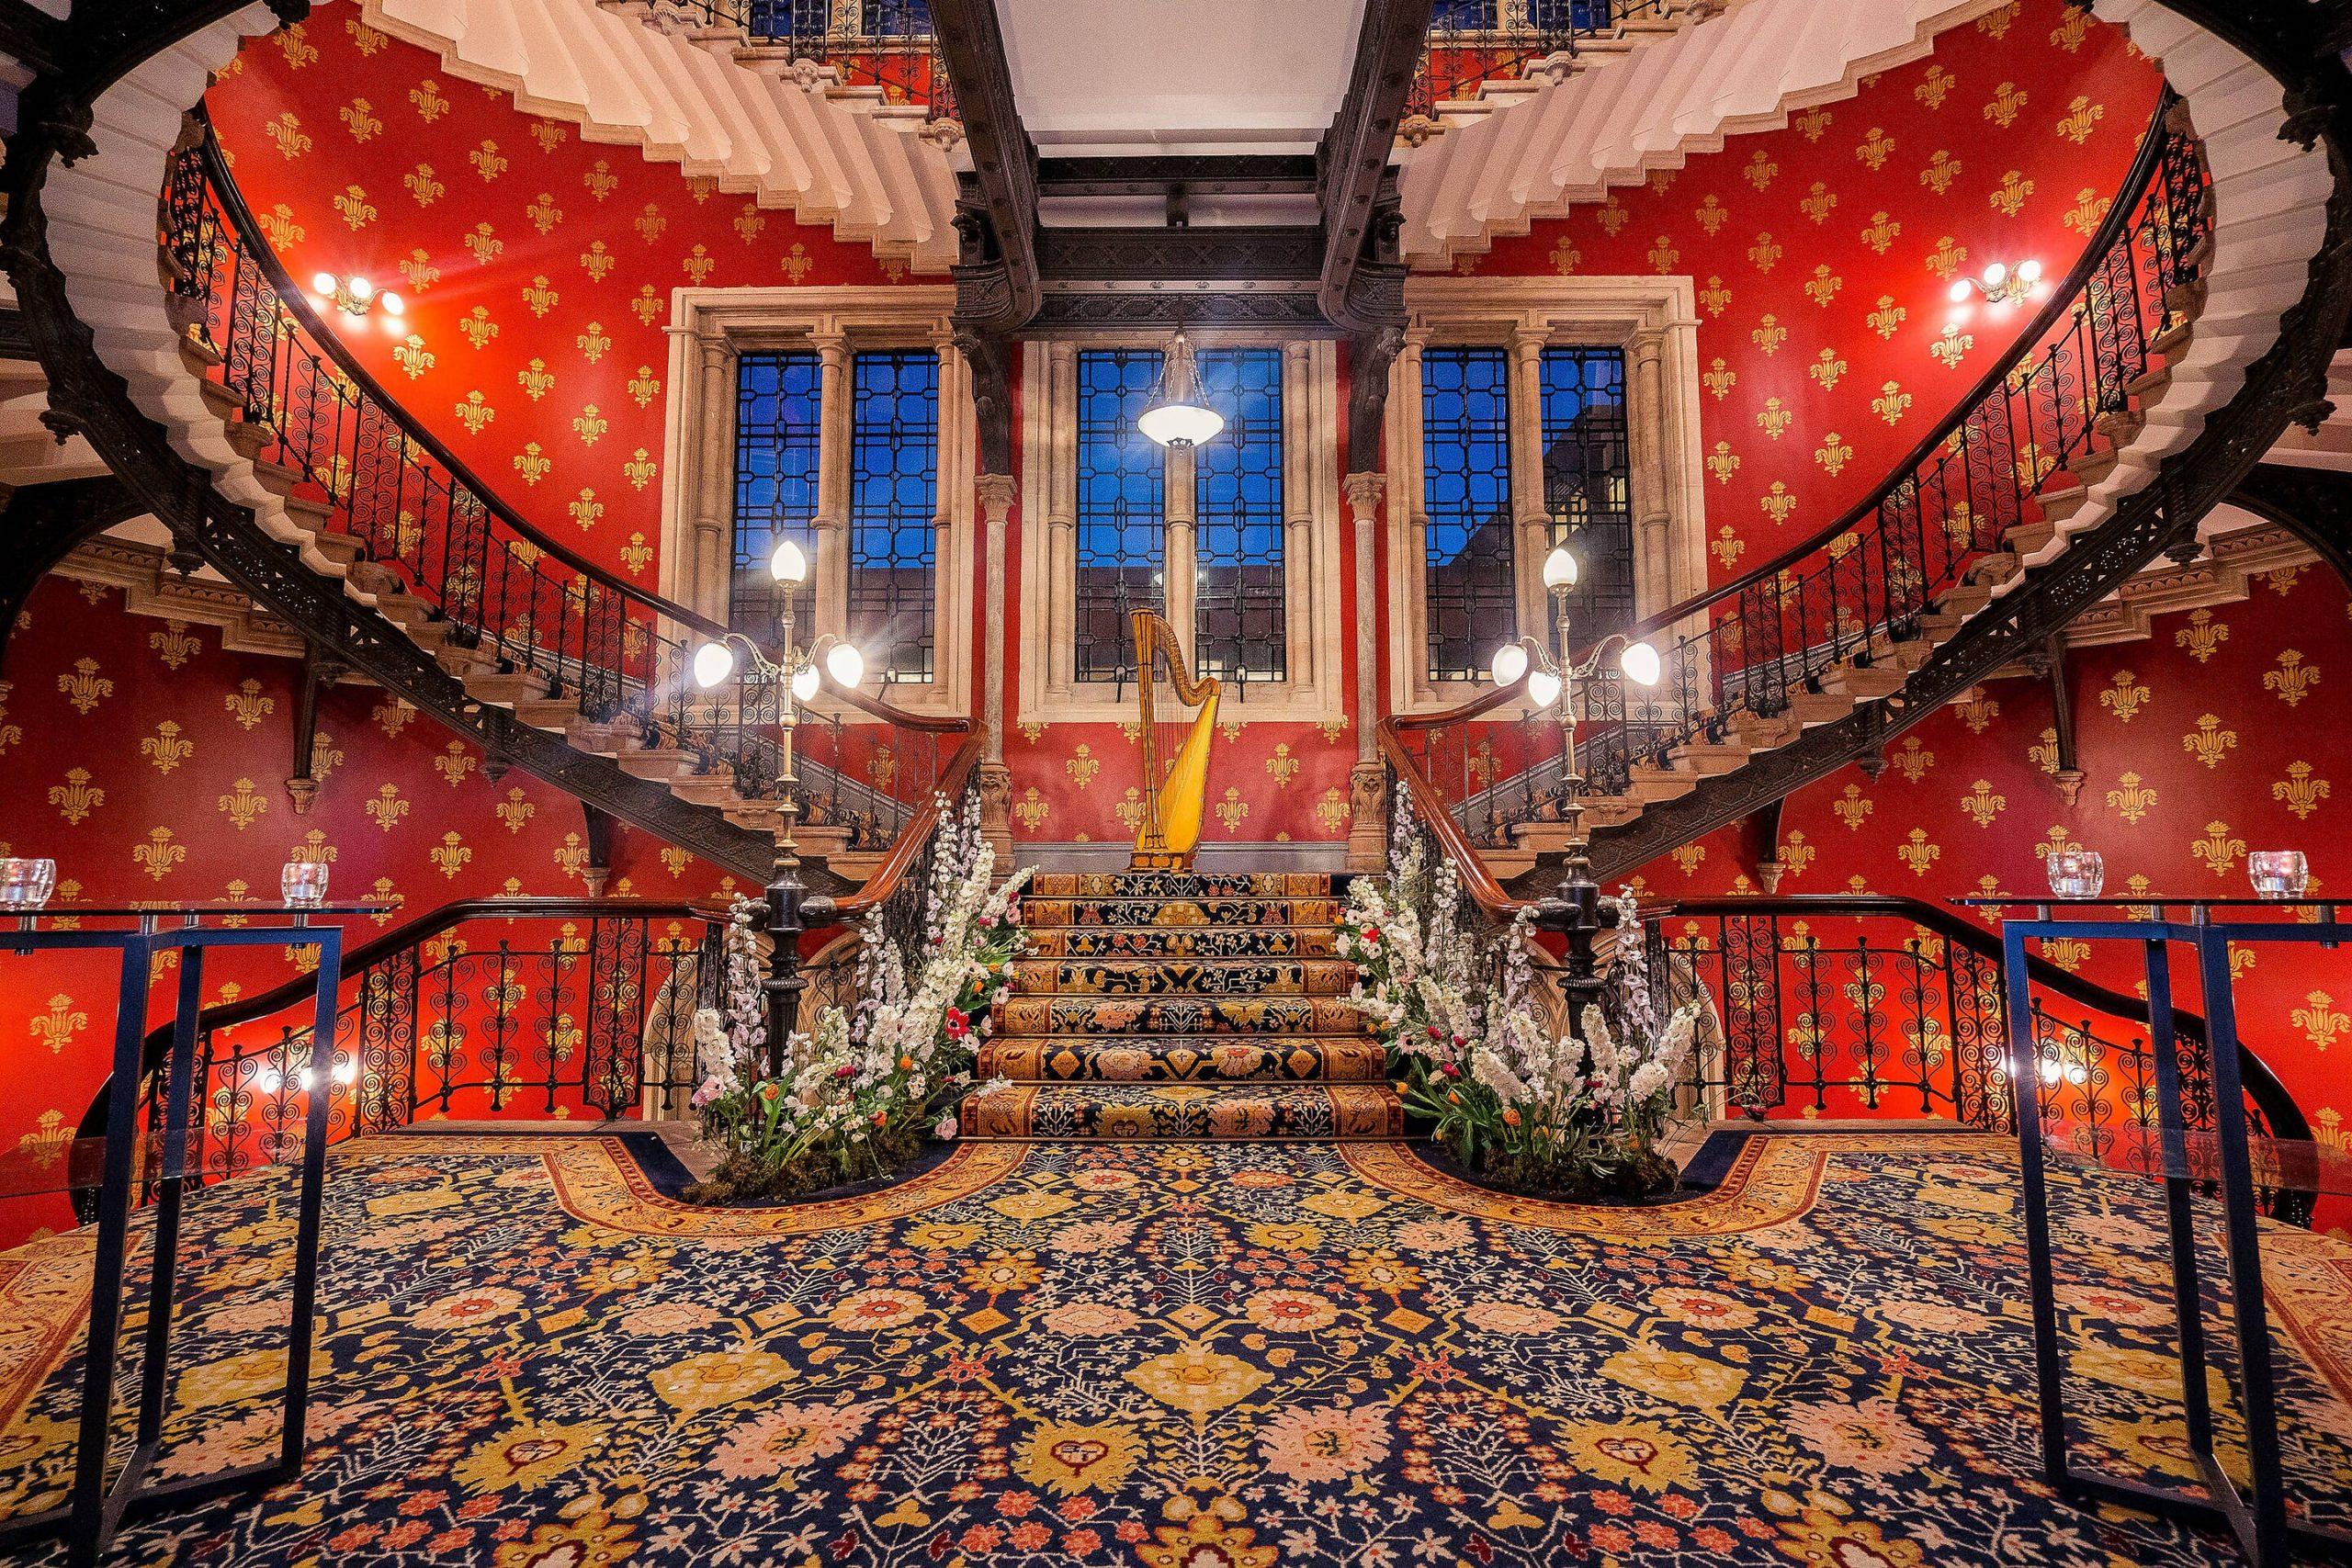 St. Pancras Renaissance Hotel London, most exclusive wedding venues in the world - Wedding Hub - 06